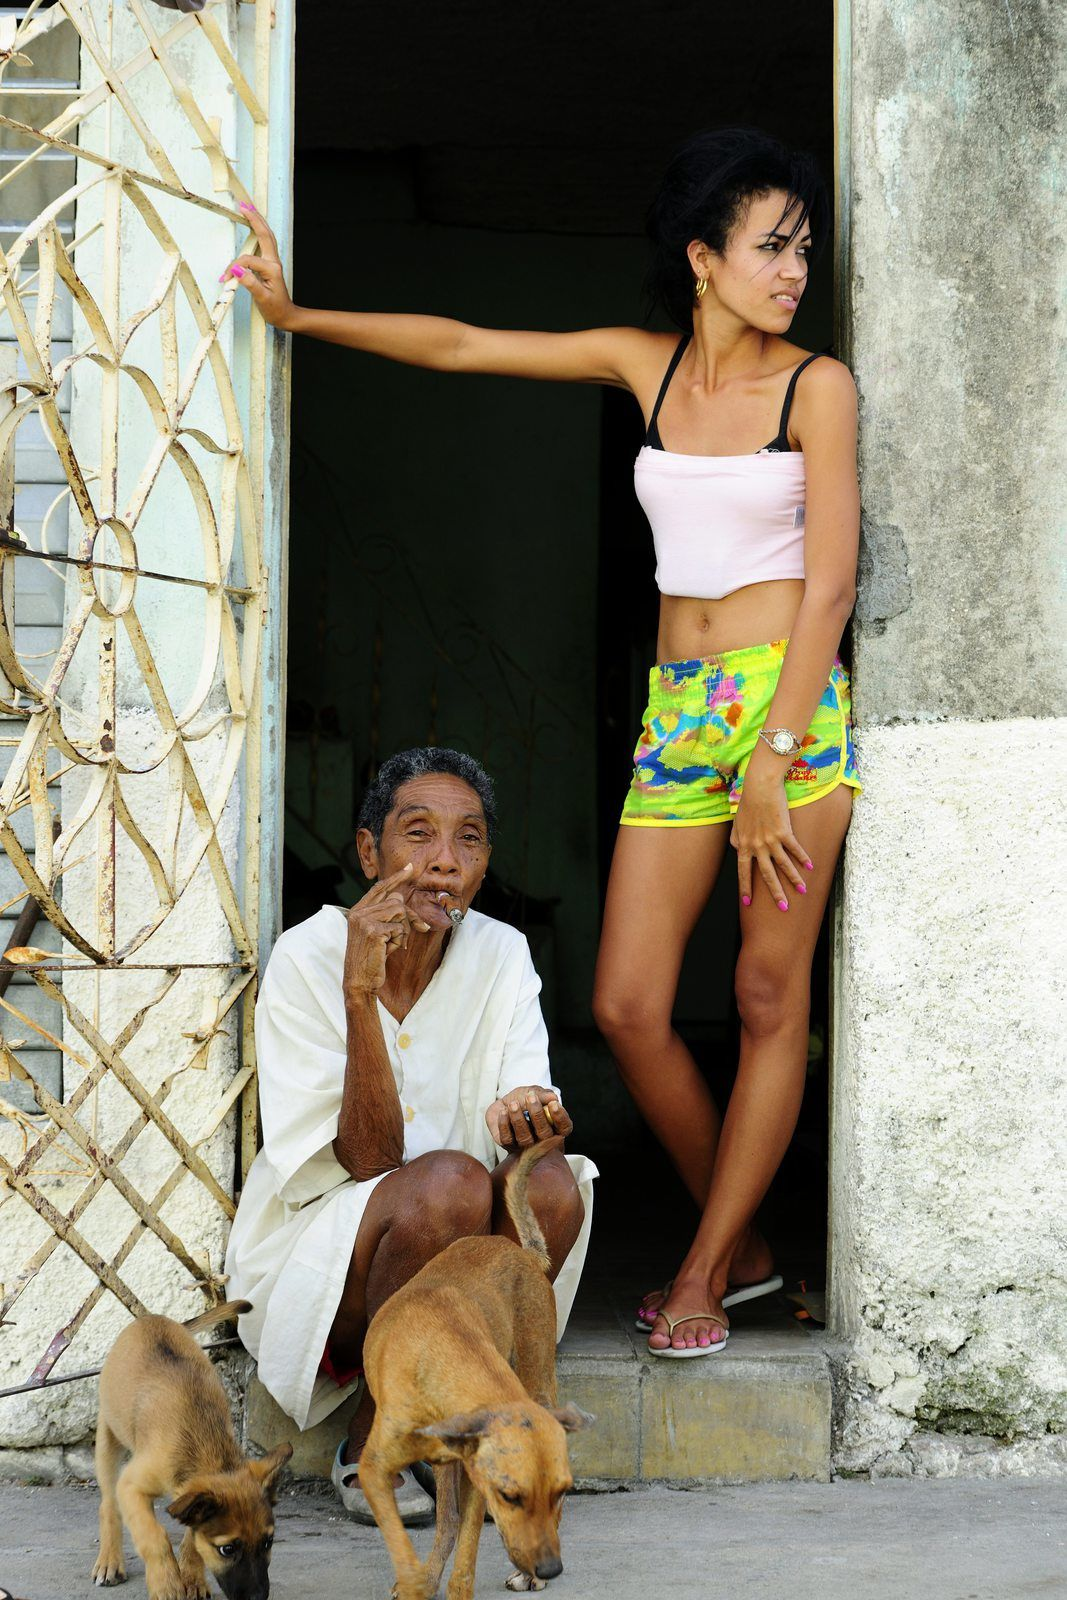 la havanne,cienfuegos, trinidad et vignales&#x3B; by albi-all pictures with the nikon d3x&#x3B; 24-70 et 70-200 en f/2.8